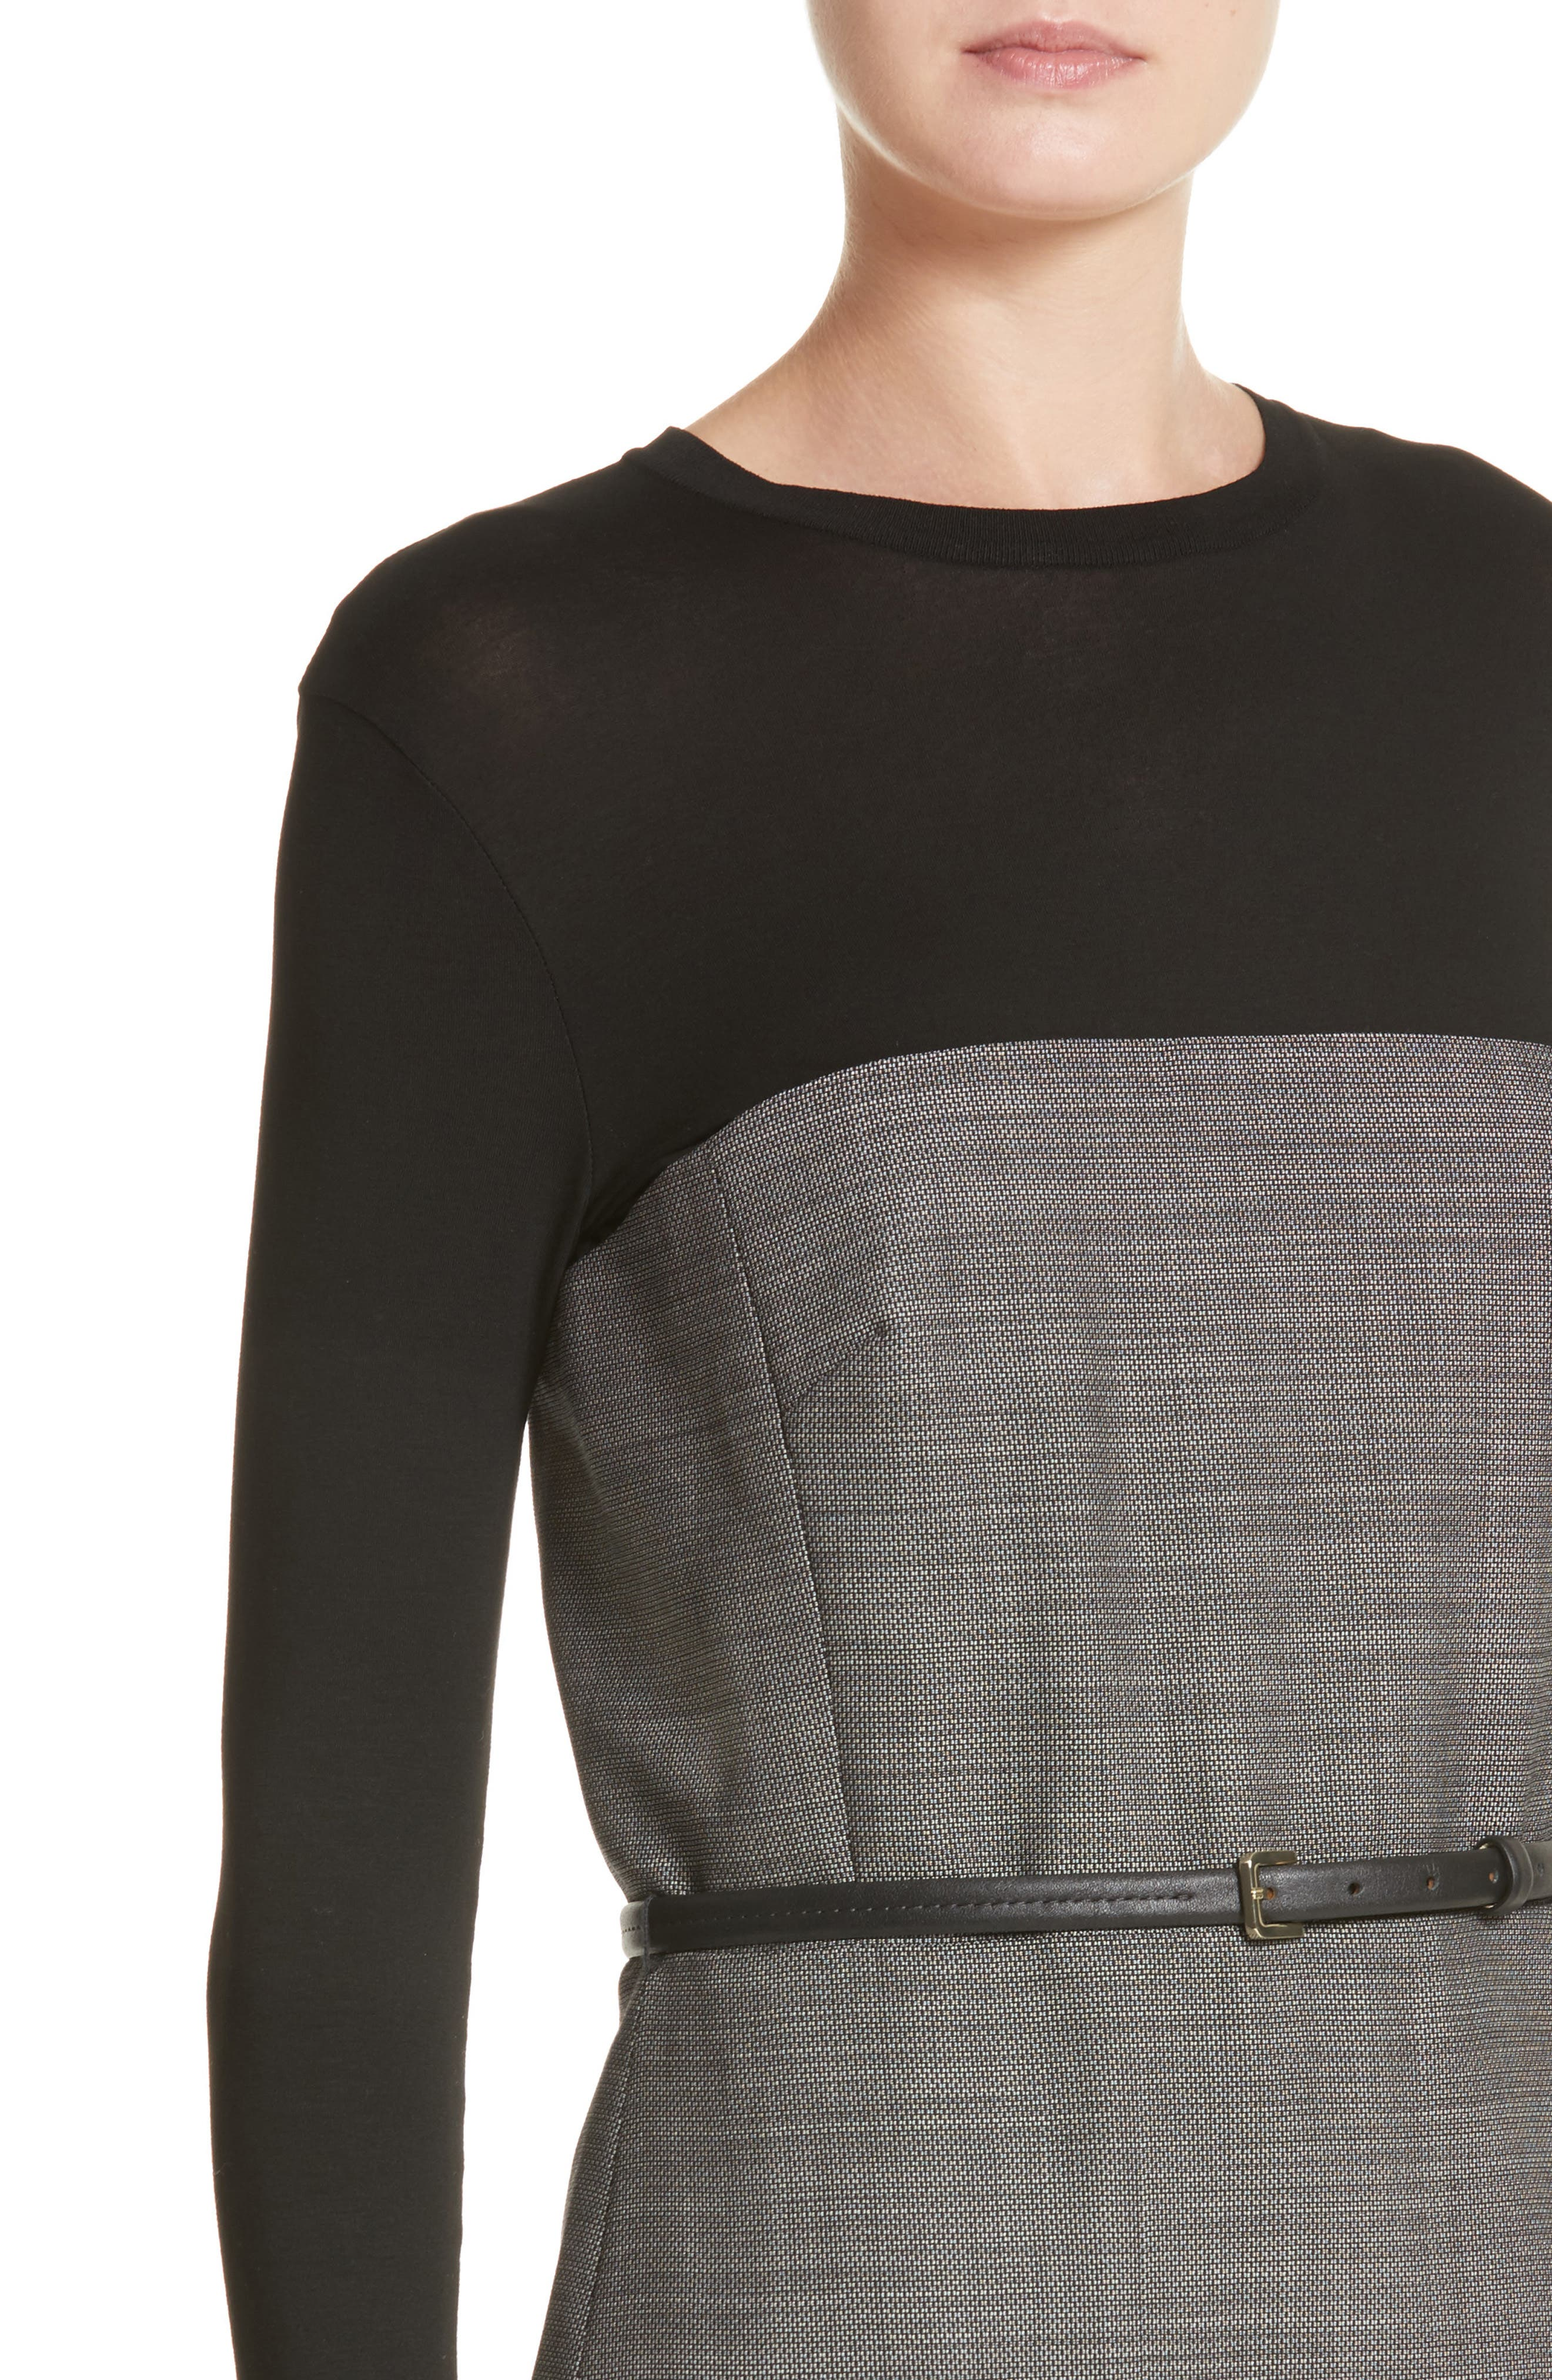 Canapa Stretch Wool Layered Sheath Dress,                             Alternate thumbnail 4, color,                             001